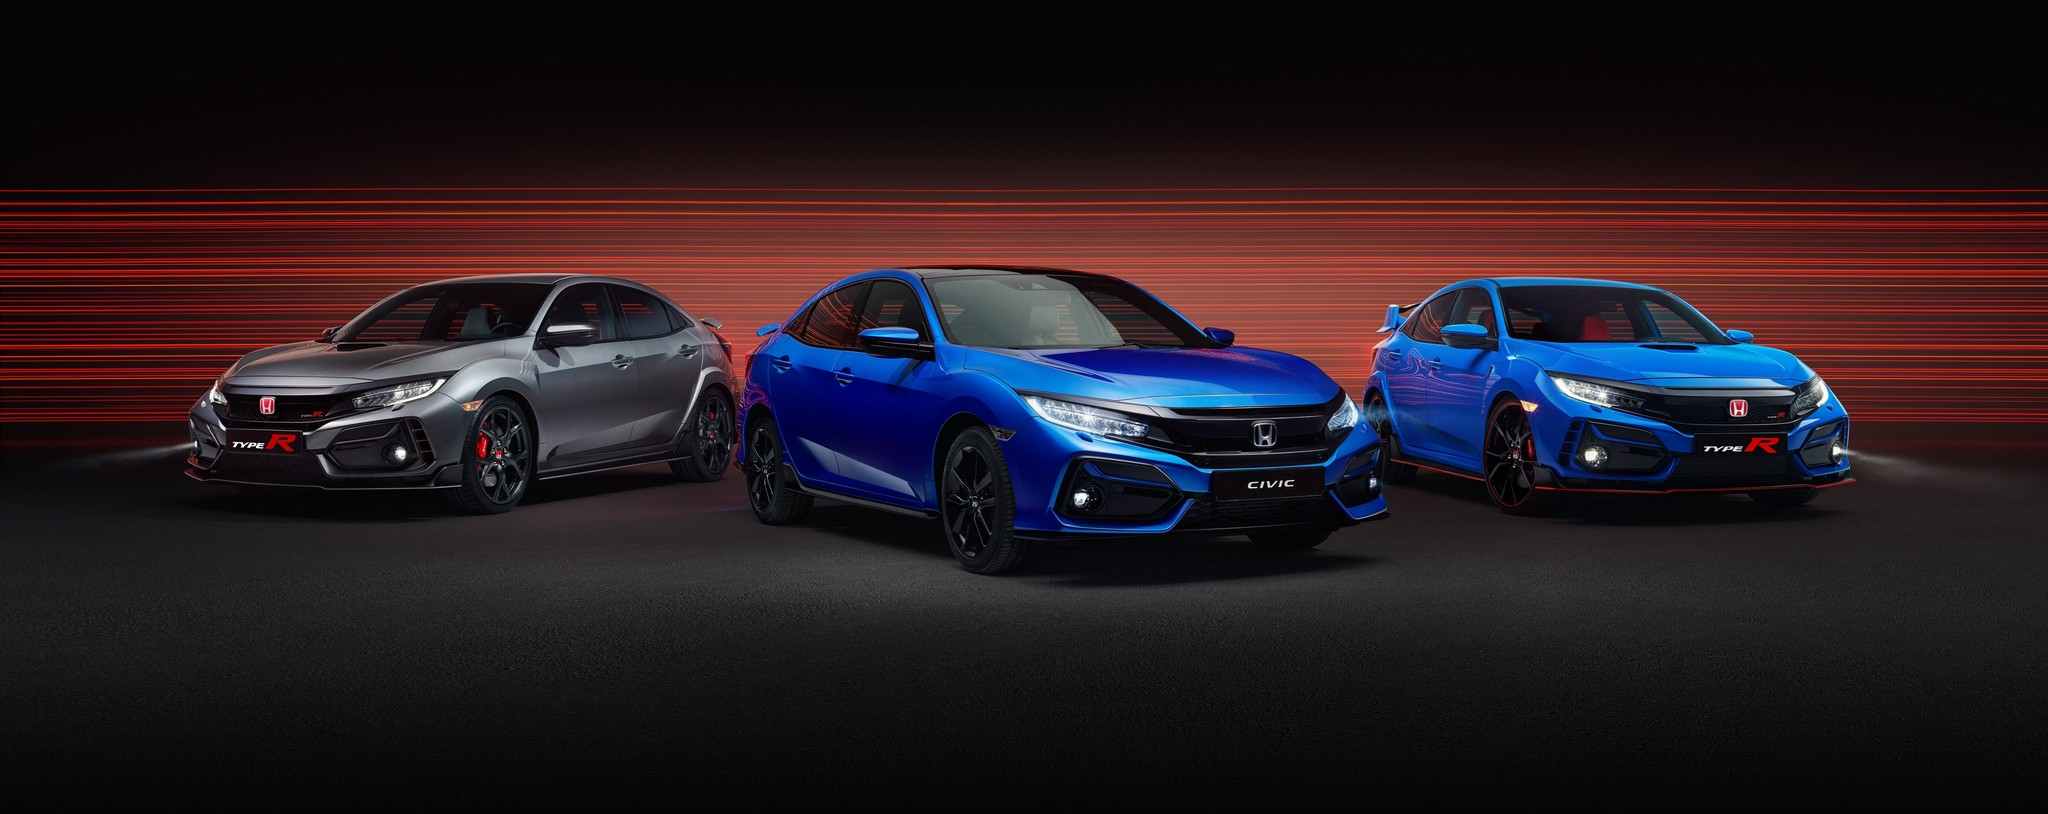 2020 Civic Type R Range - Type R Sport Line, Civic Sport Line, Type R GT